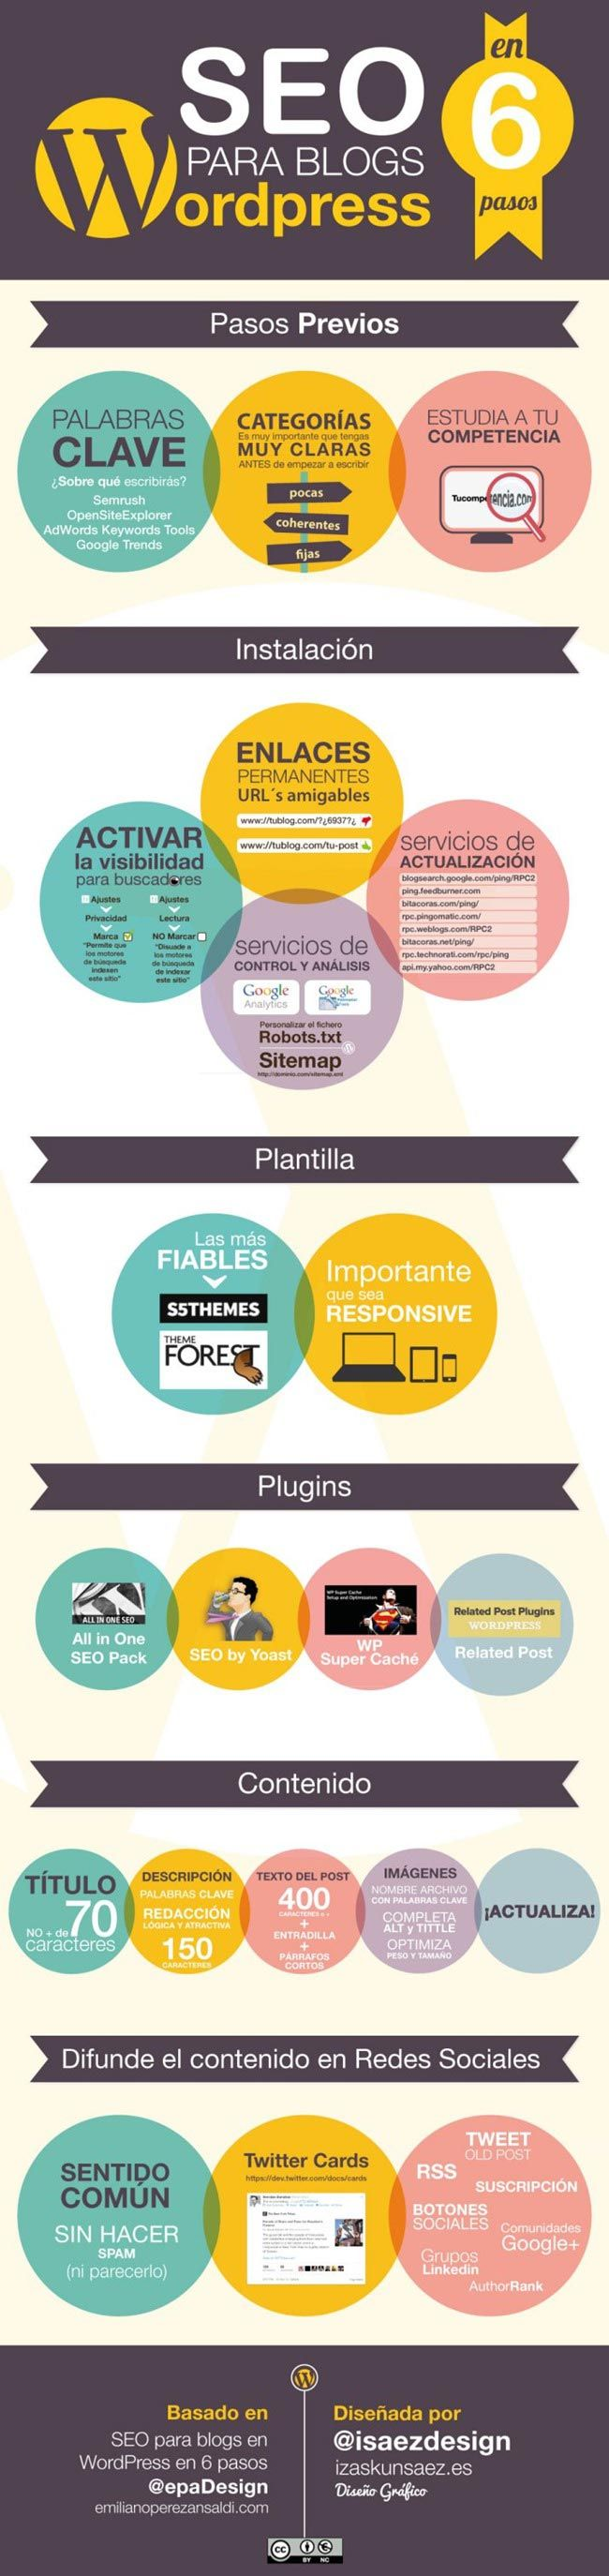 infografia SEO para WordPress en 6 pasos